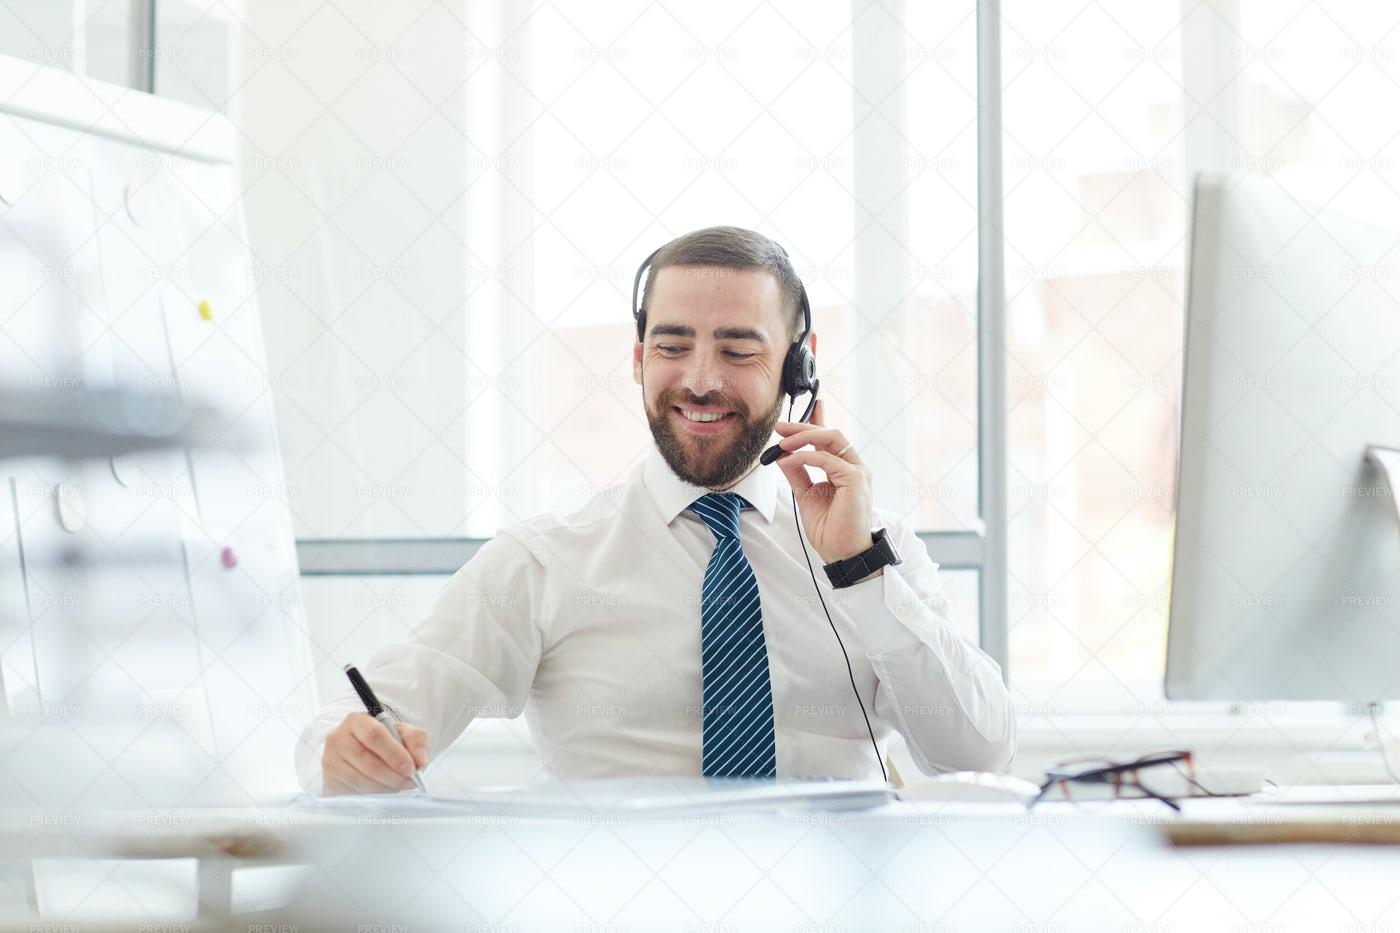 Call Center Agent At Work: Stock Photos